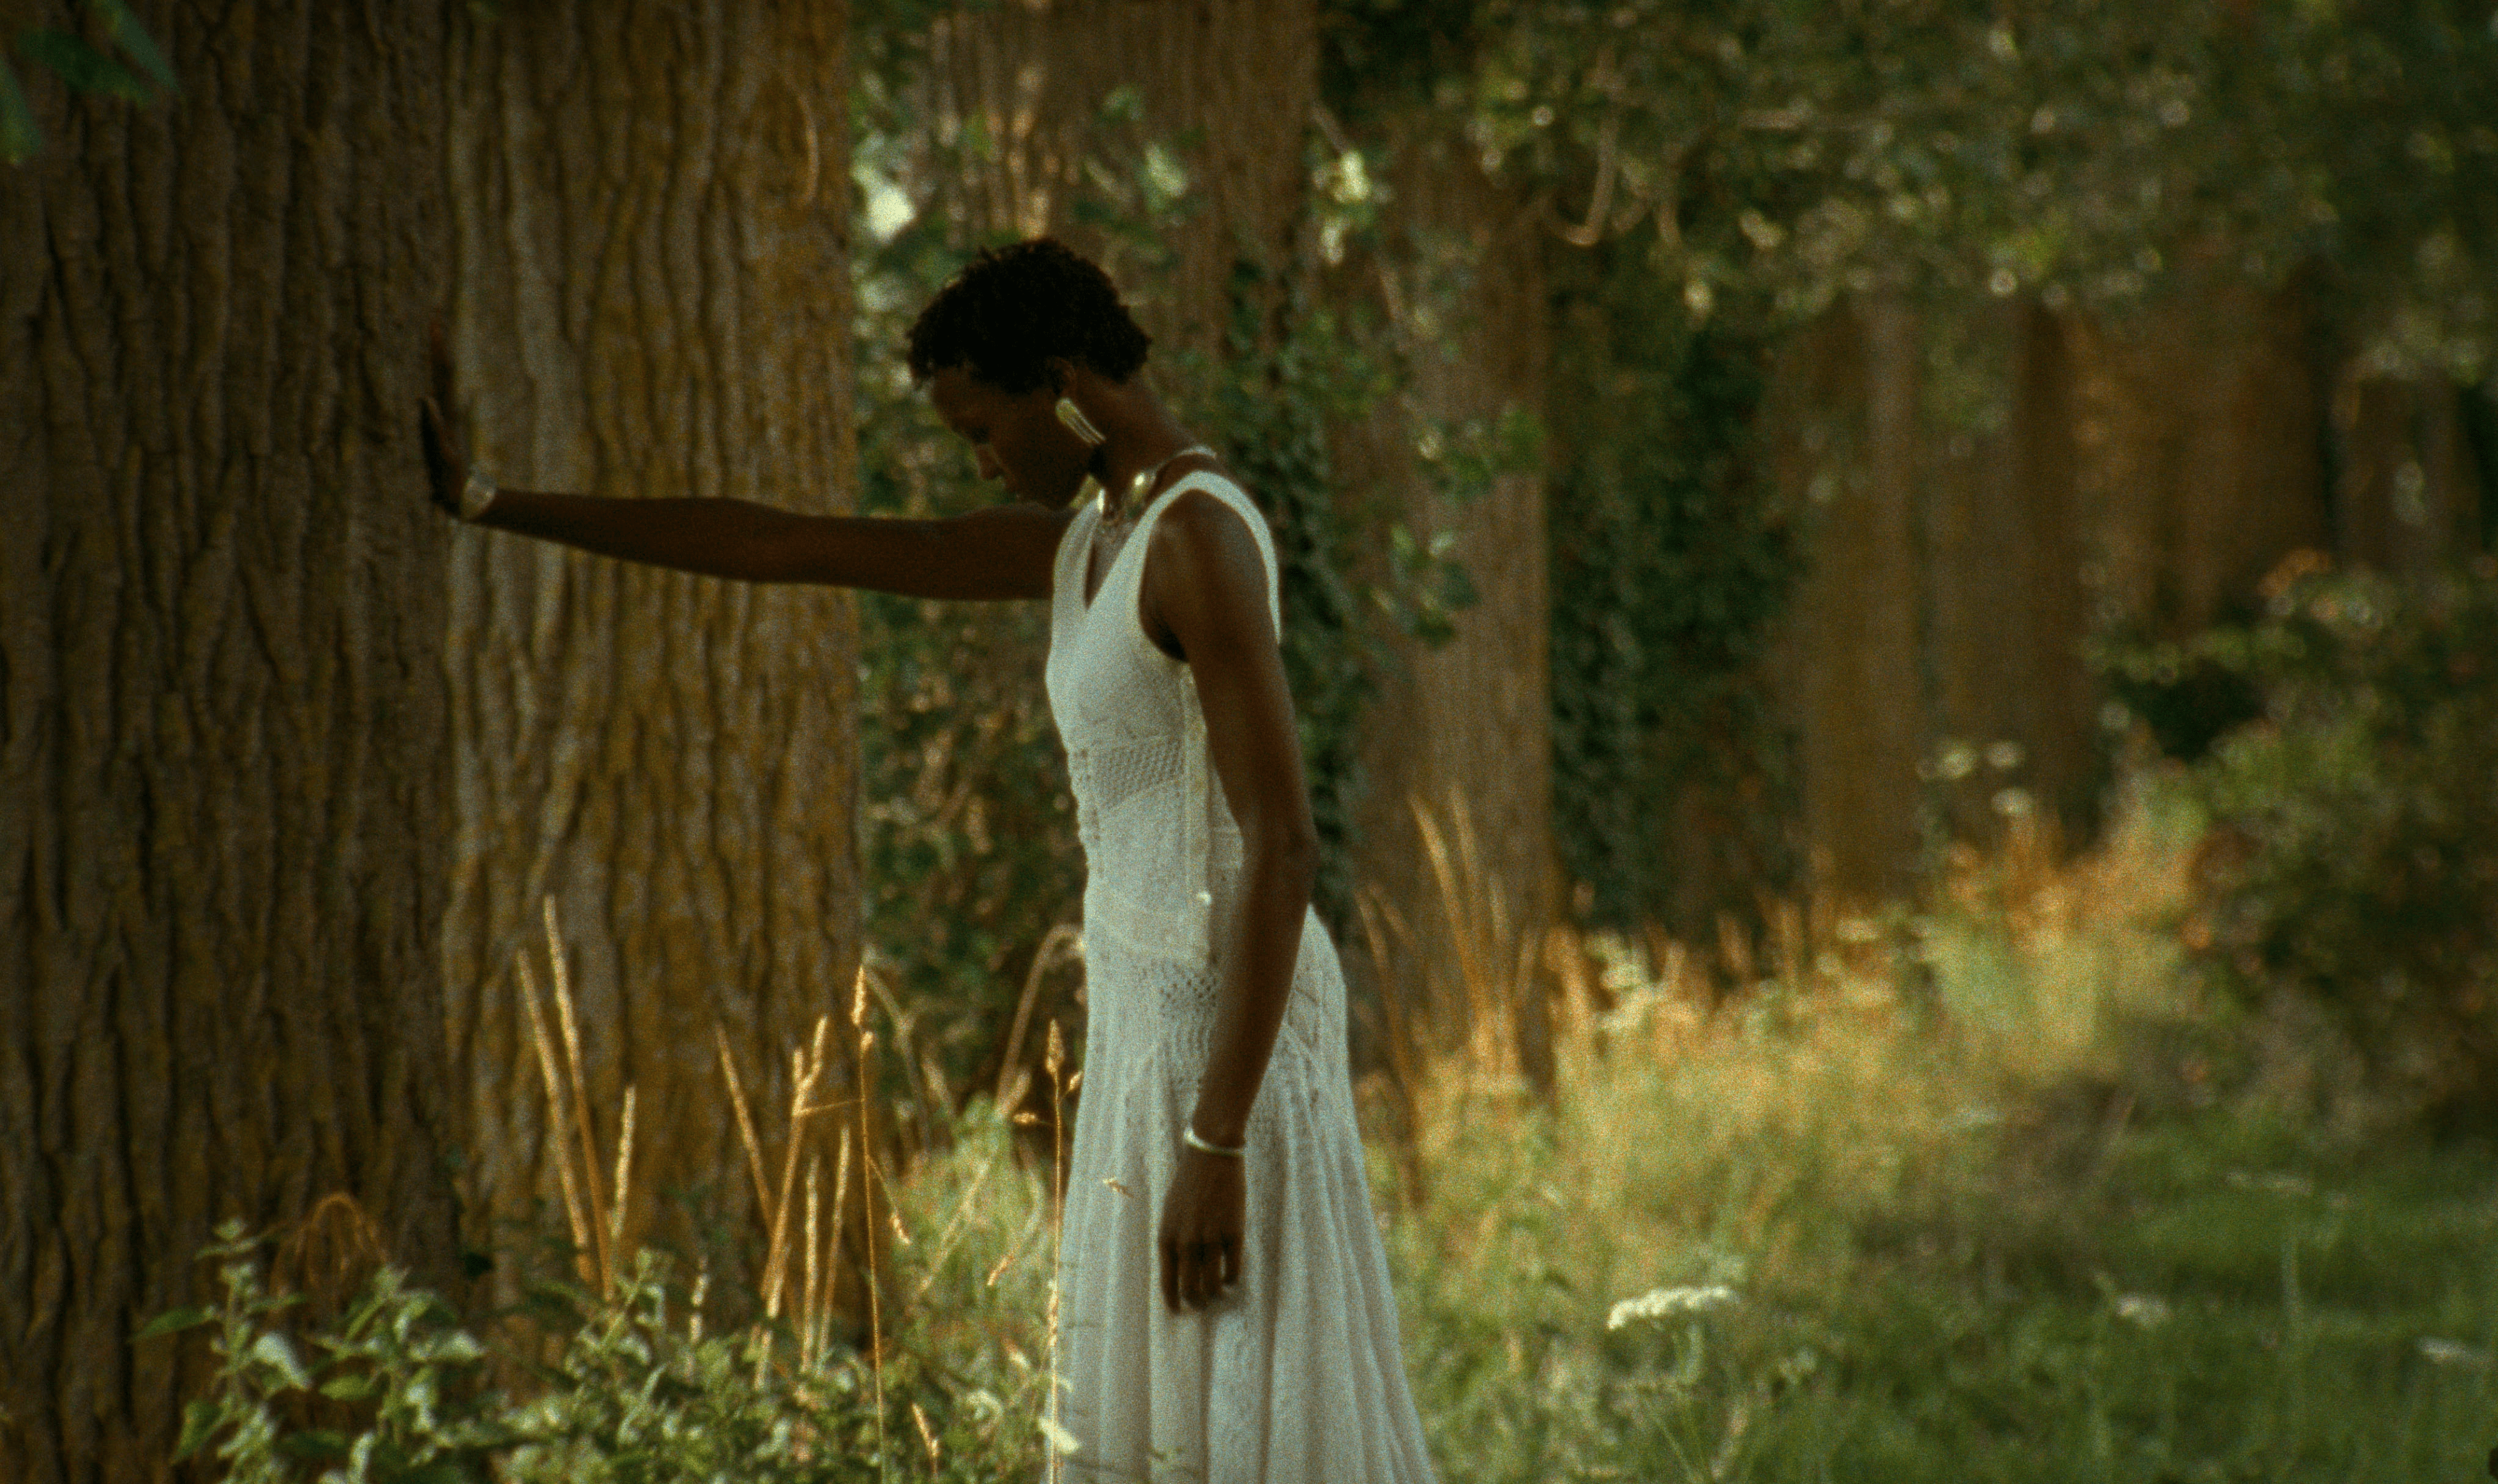 Rouguy Faye — 'Ostal 24' Marine Serre